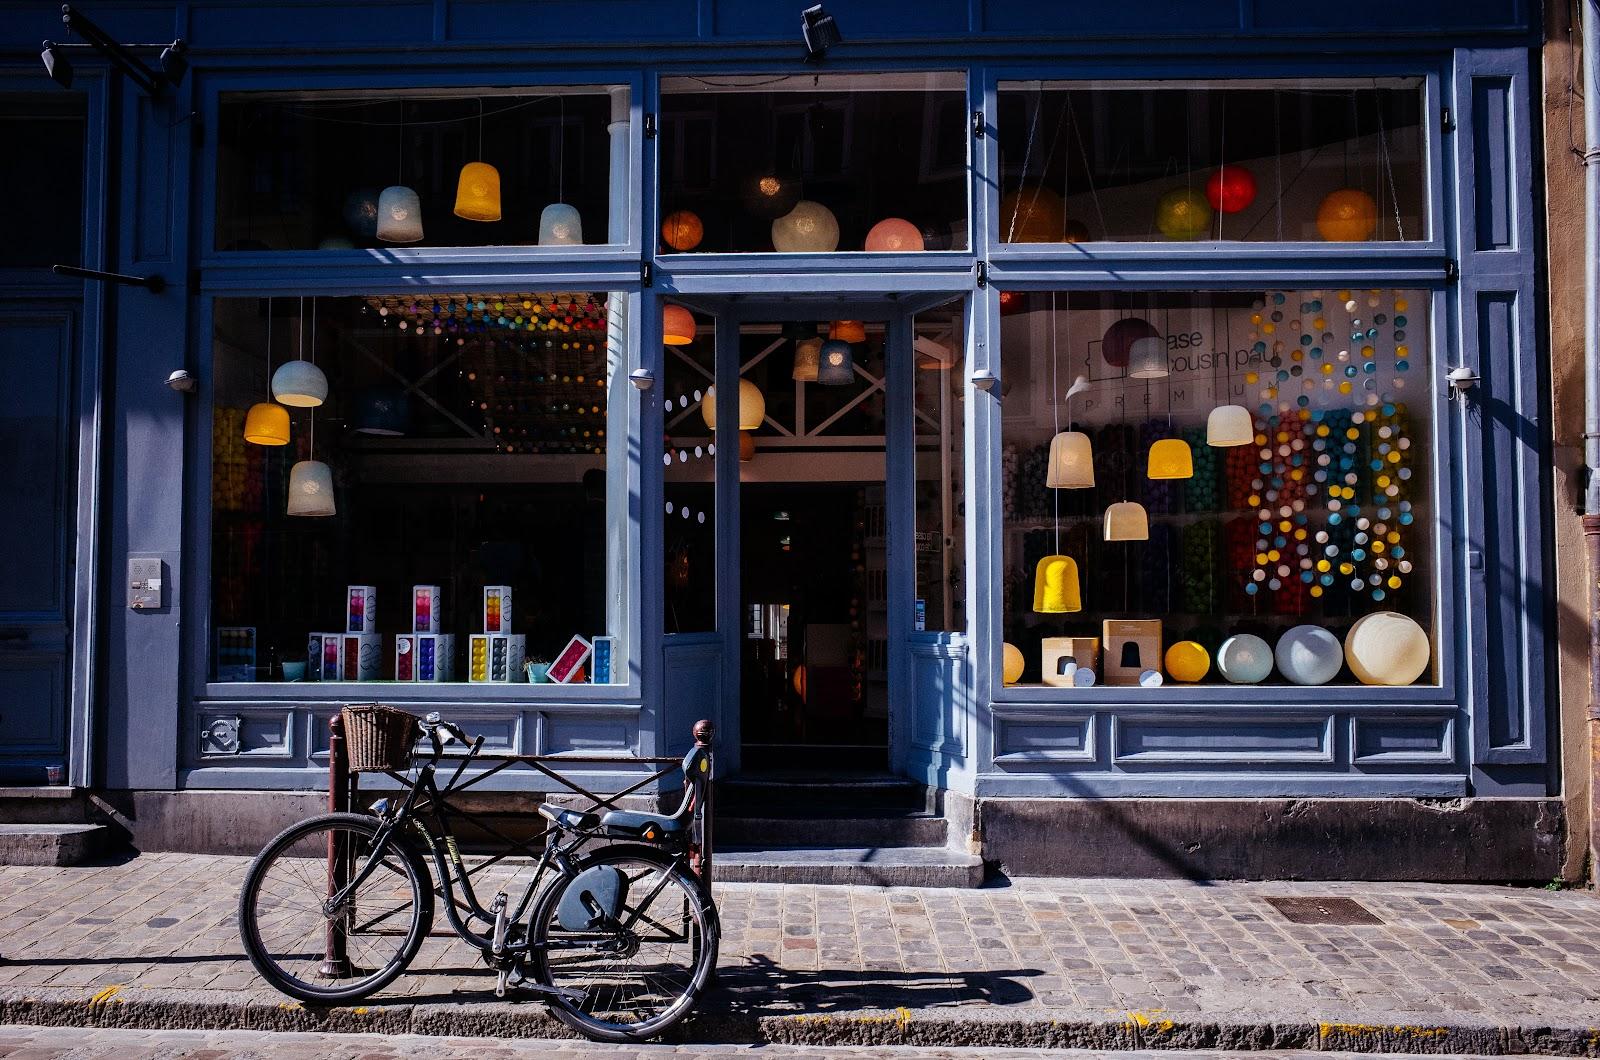 9 Reasons Your Business Should Start a Rewards Program 2